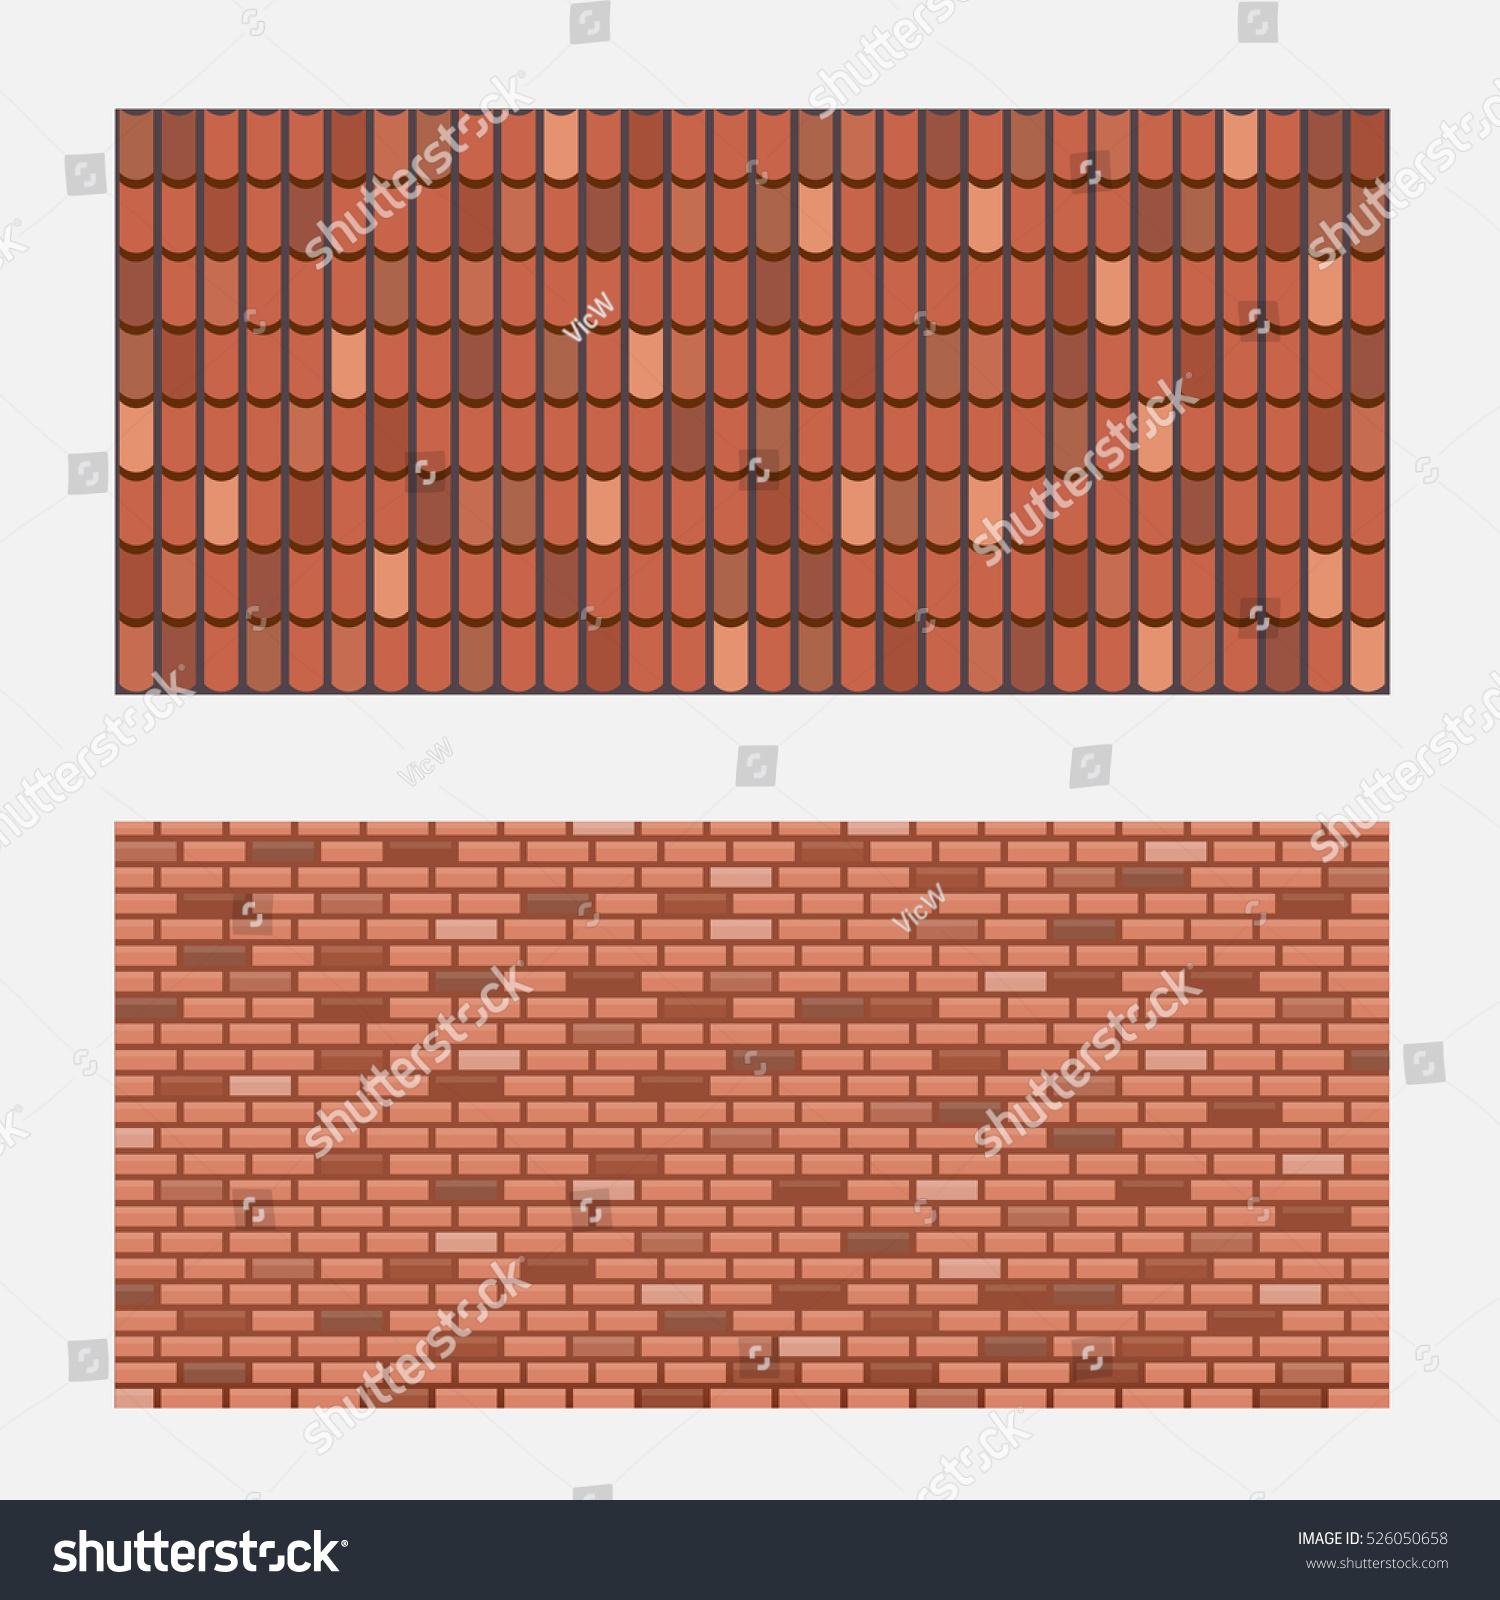 Brick Wall Design Tiles : Image photo editor shutterstock